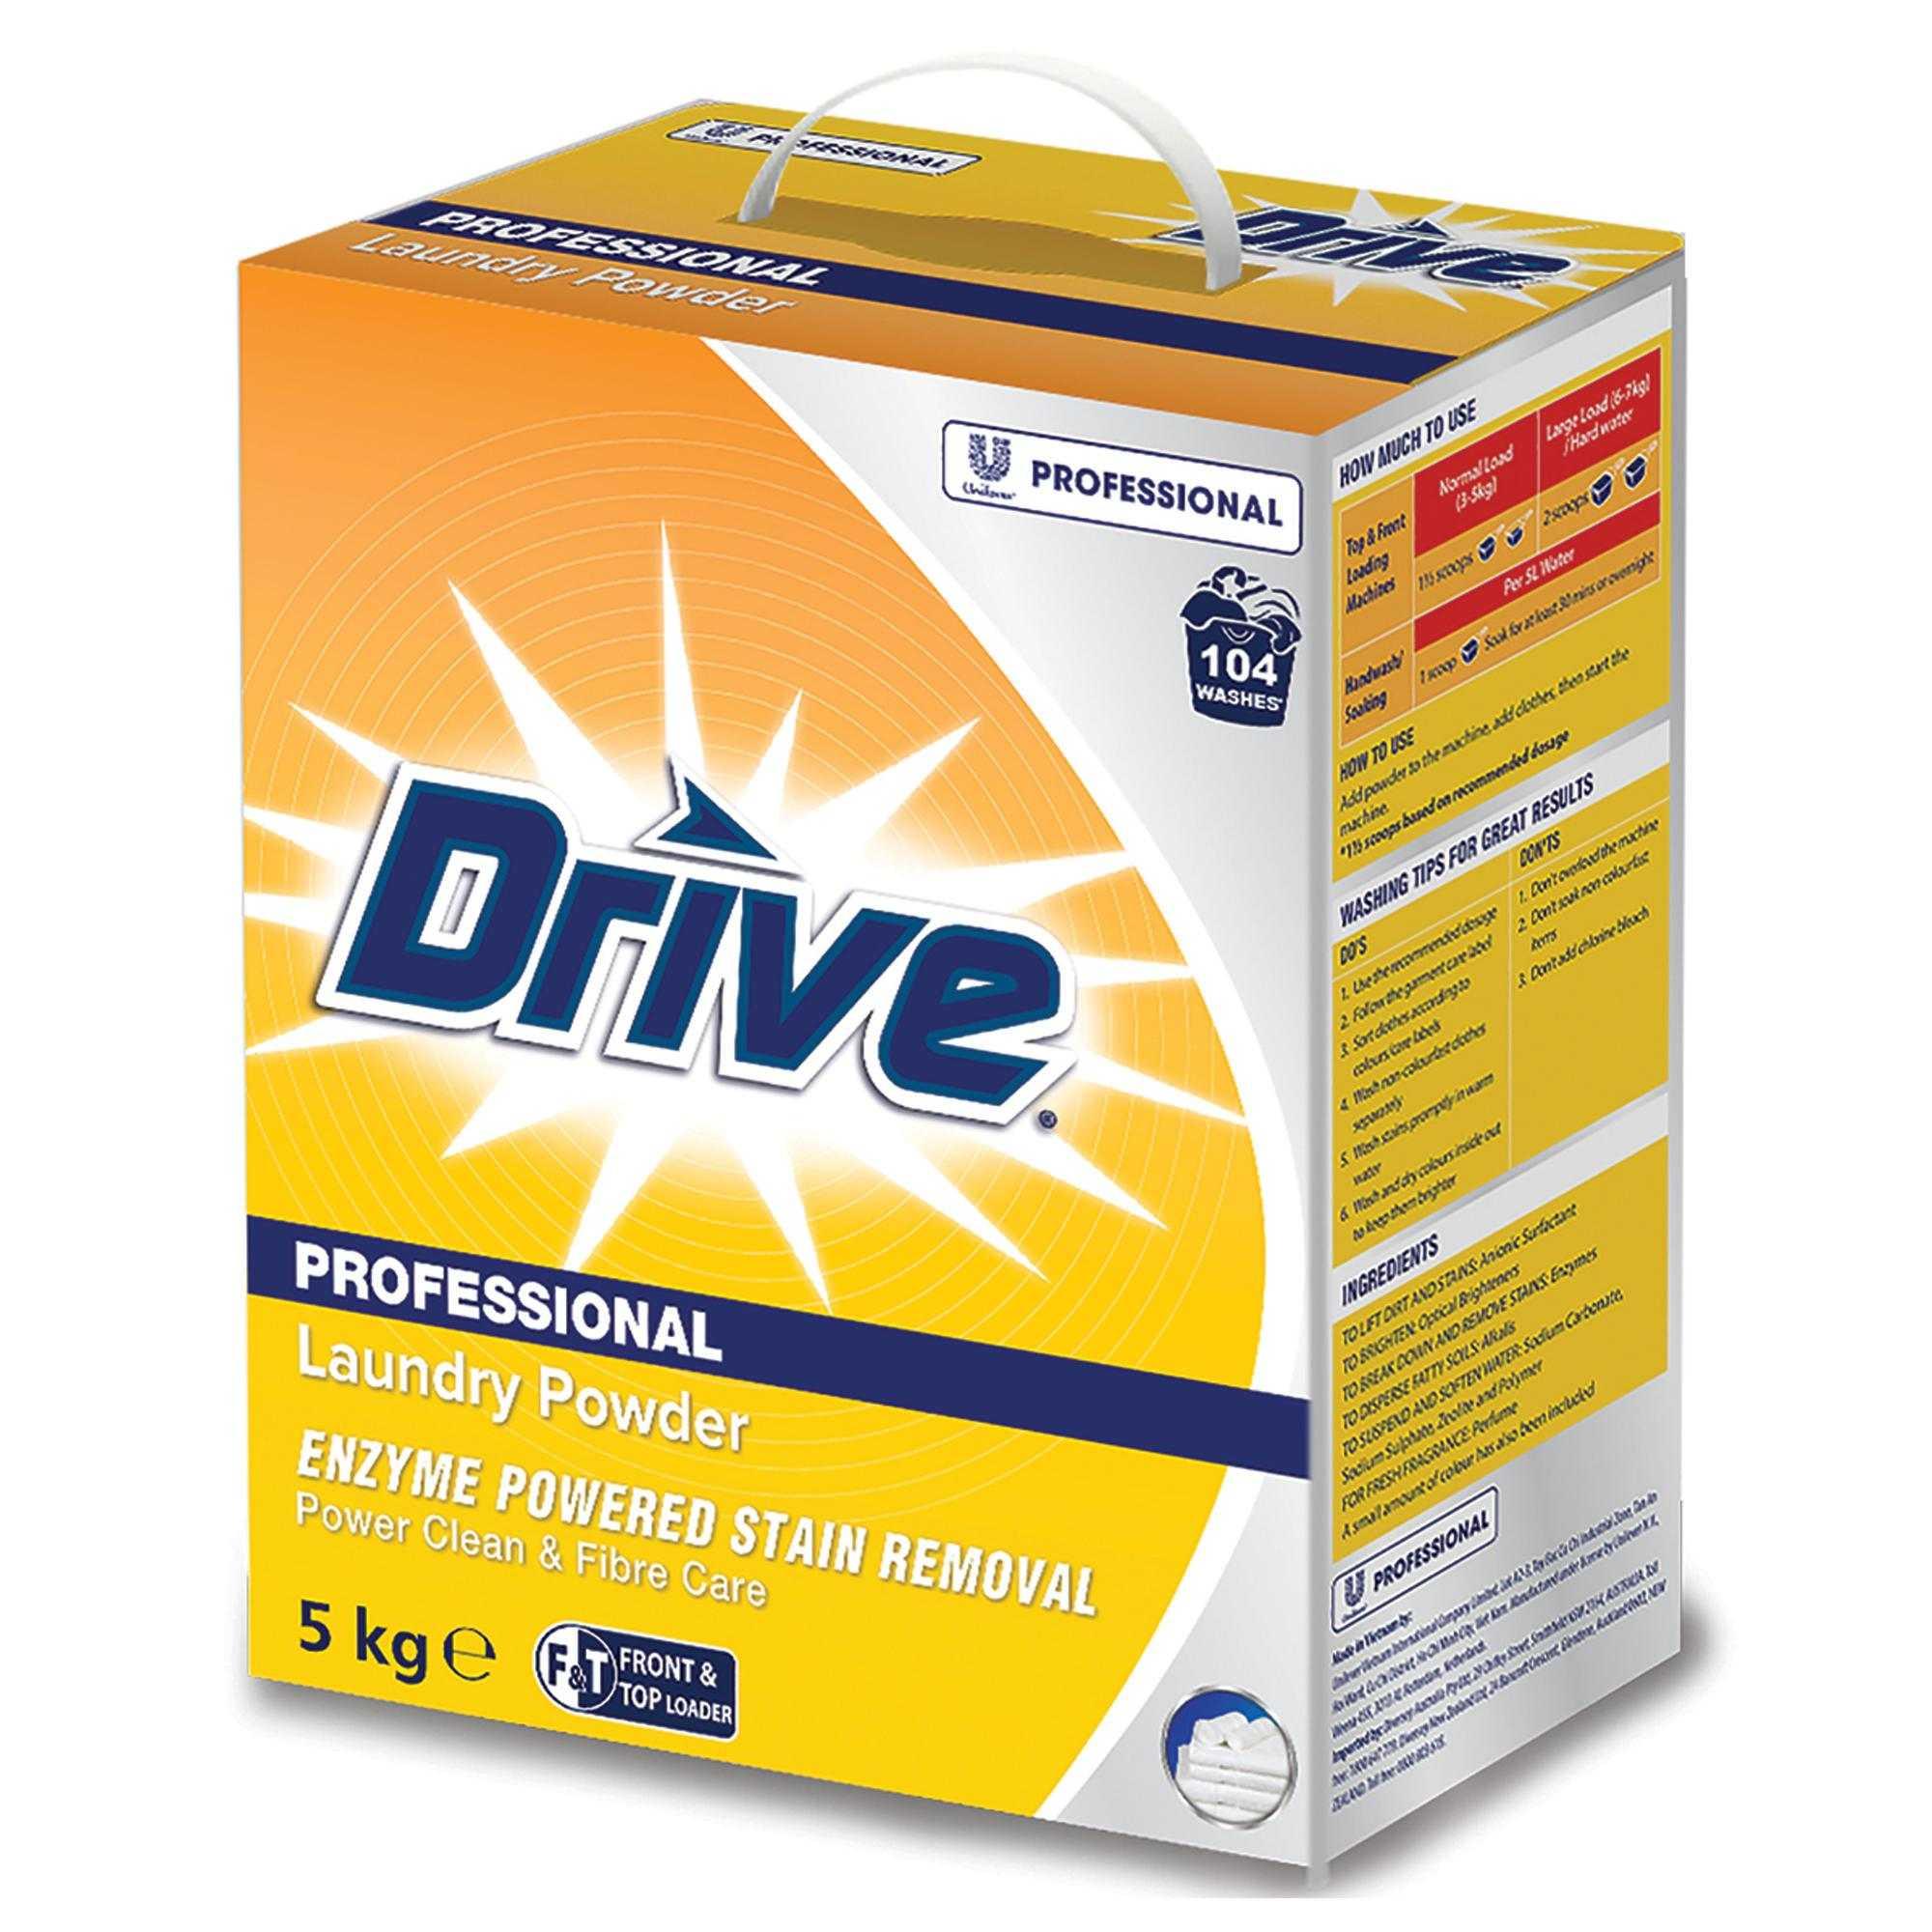 67787882_Drive%20Carton%20ANZ%202000x2000px-1.jpg